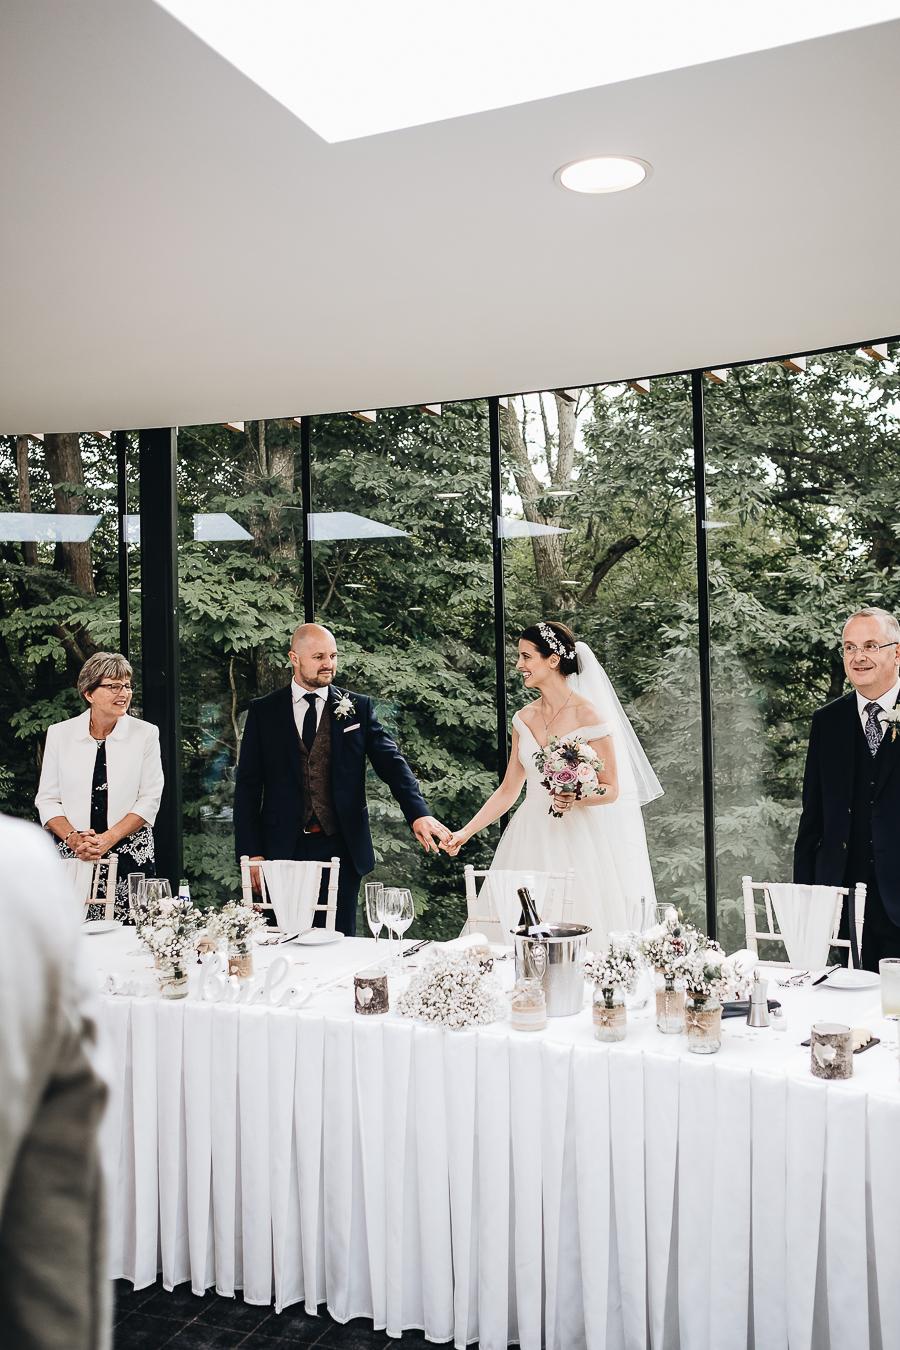 OurBeautifulAdventure-FairyhillWedding-John&Zoe-WeddingBlog-6775.jpg